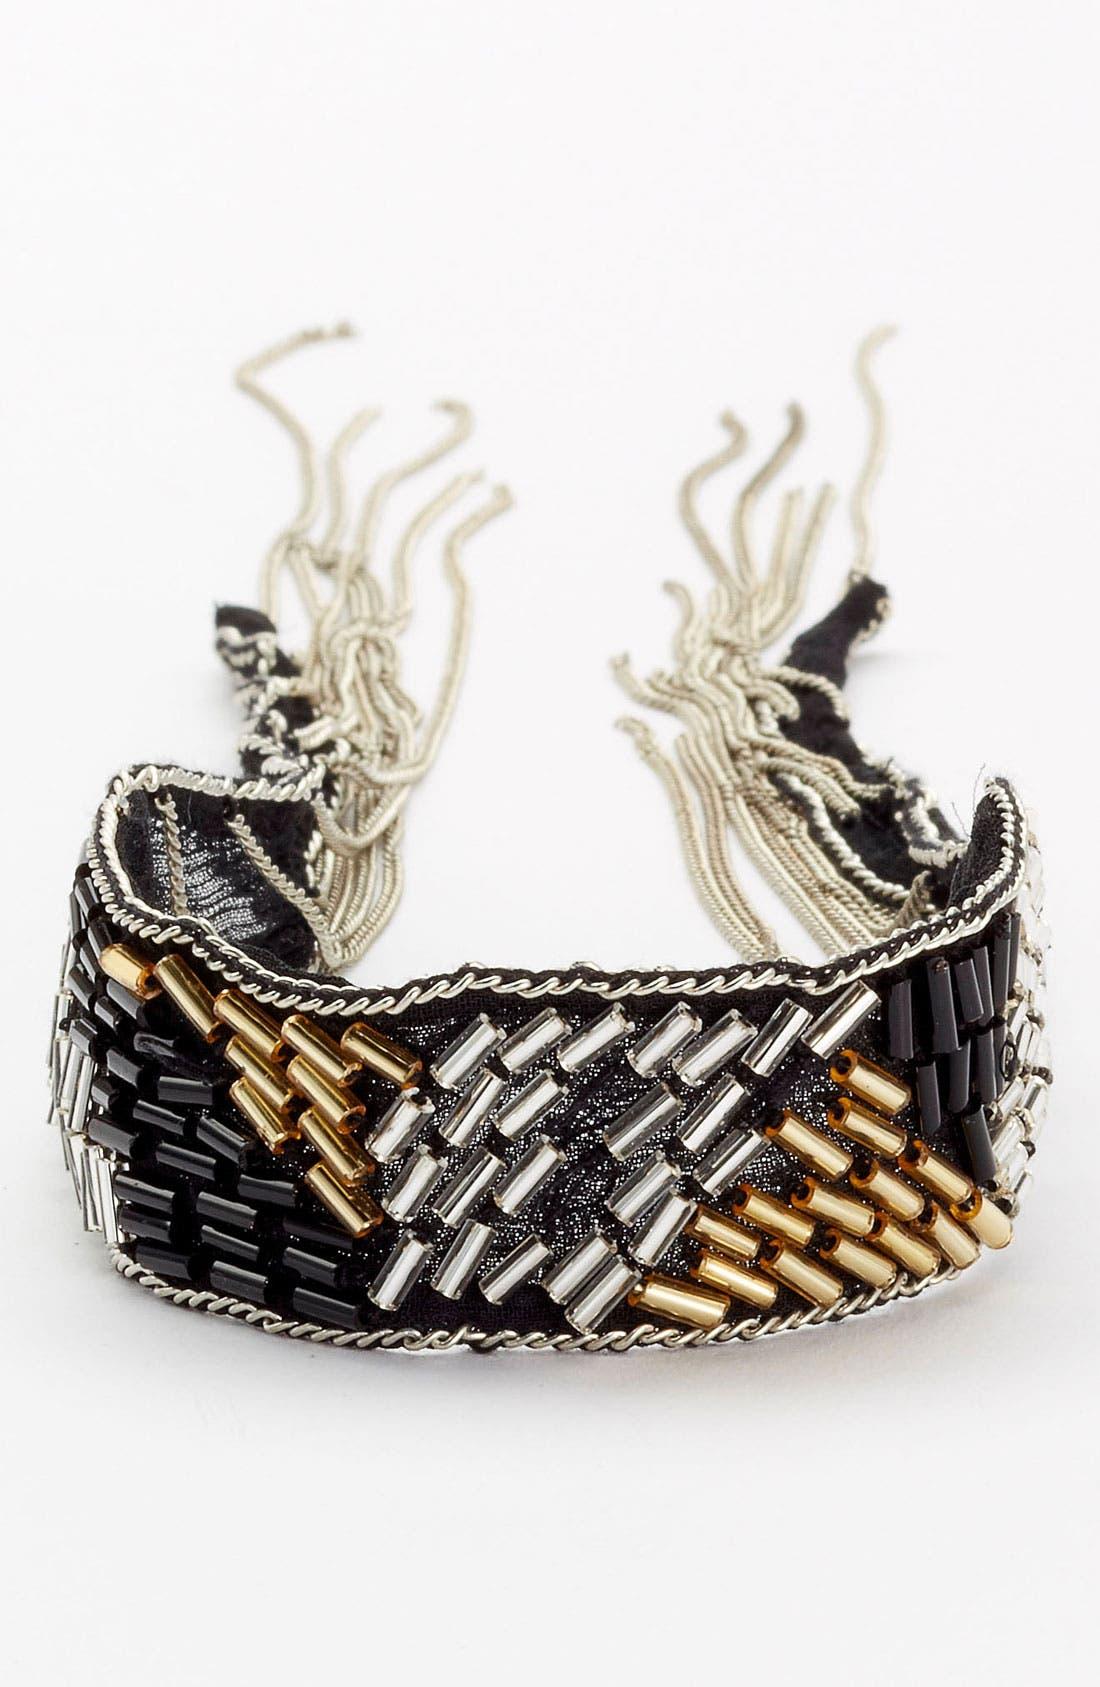 Alternate Image 1 Selected - Chan Luu Silk Chiffon Tie Bracelet